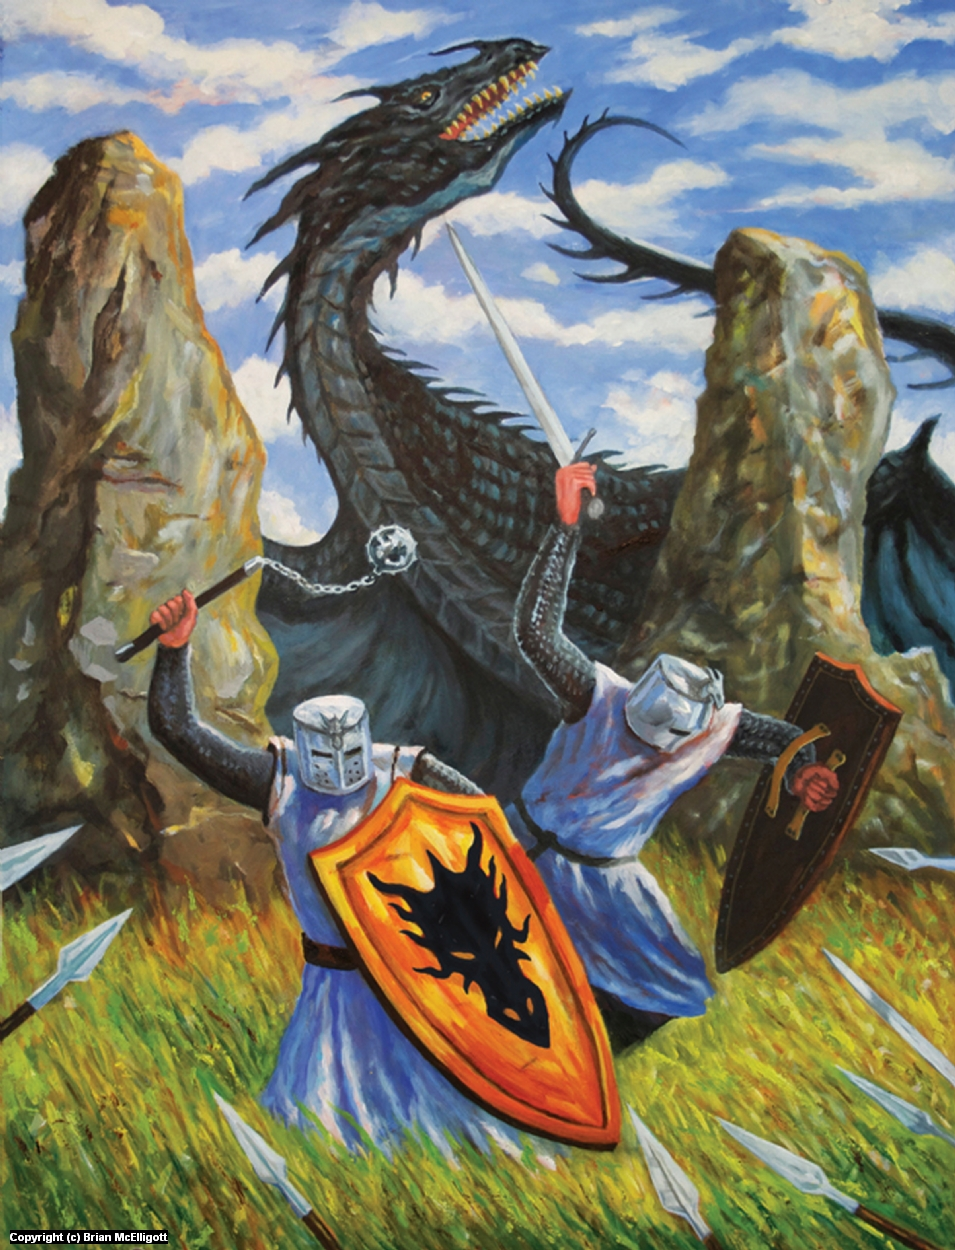 Brotherhood of the Dragon Artwork by Brian McElligott